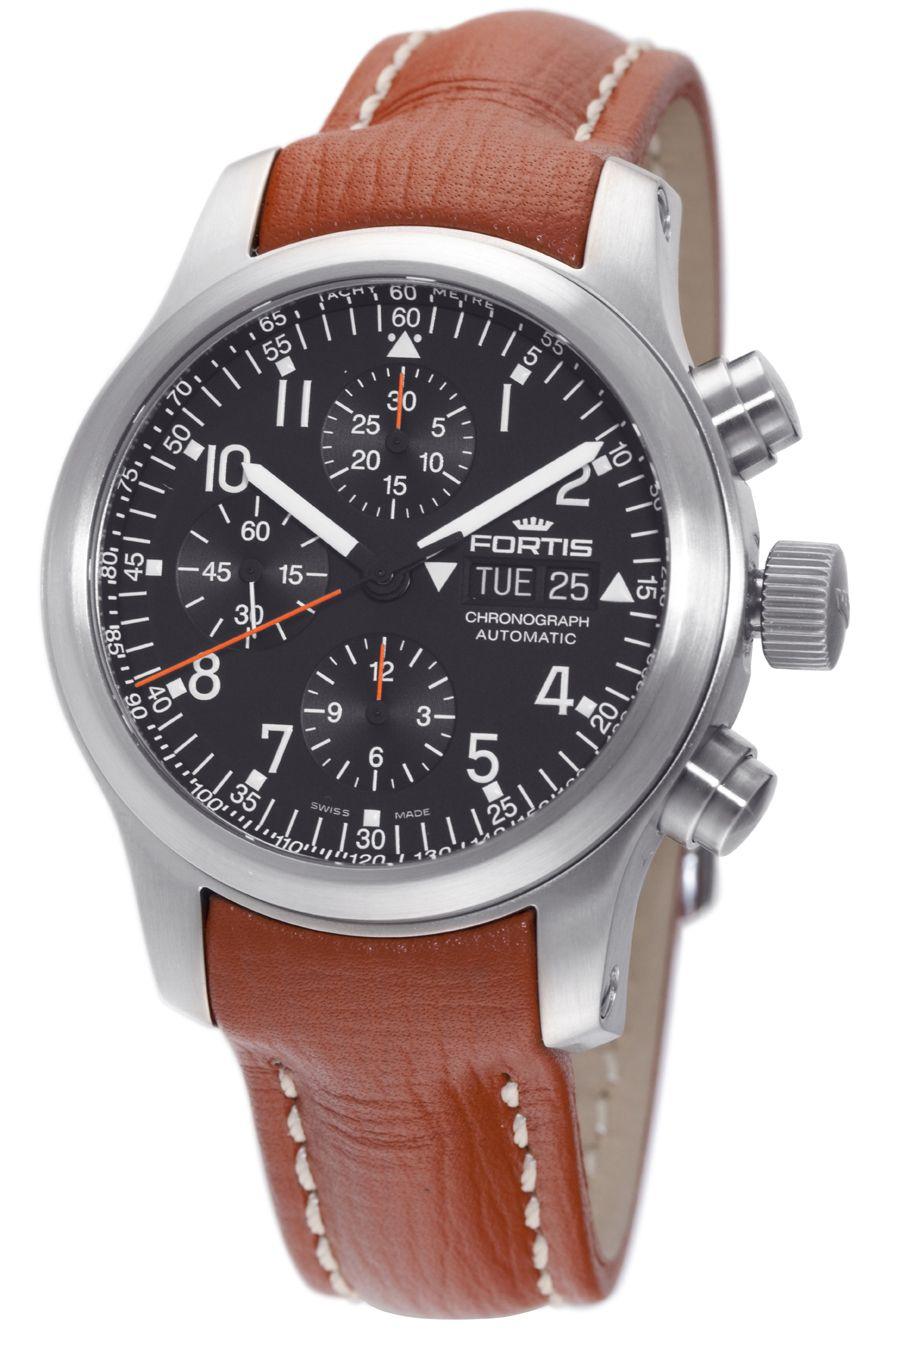 9d9f43f2aec Fortis Mens B-42 Pilot Professional Chronograph - 635.10.11 L.08 Relógios